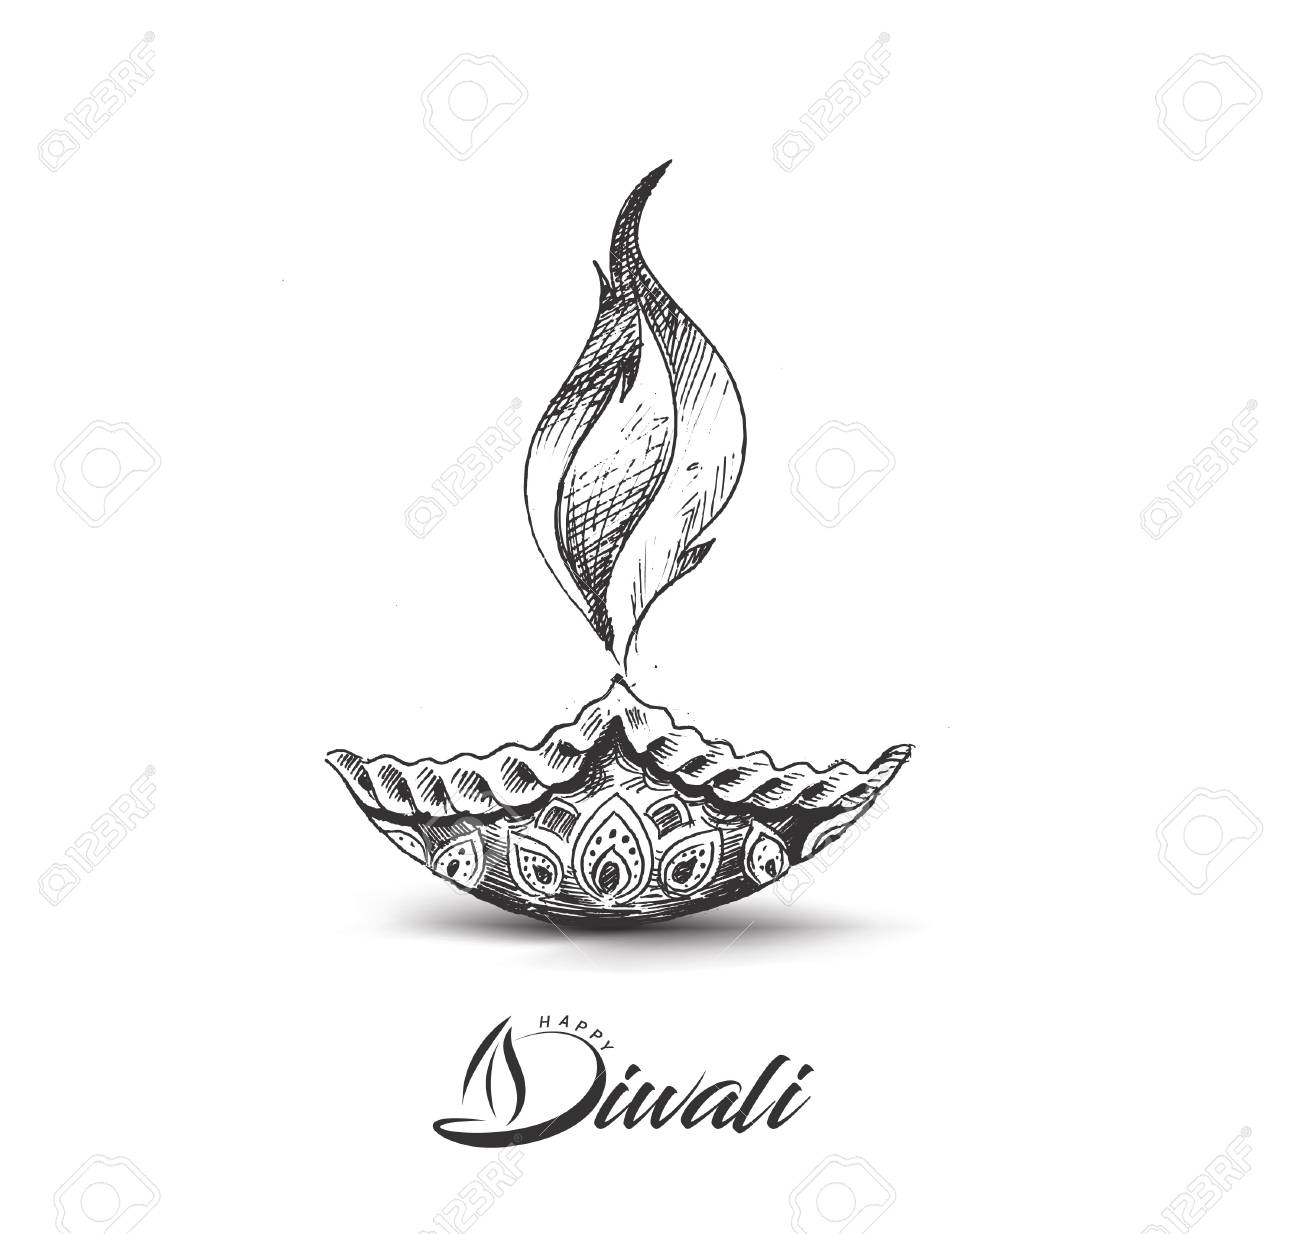 Diwali Festival Oil Lamp Diya Hand Drawn Sketch Vector Royalty Free Cliparts Vectors And Stock Illustration Image 87797924